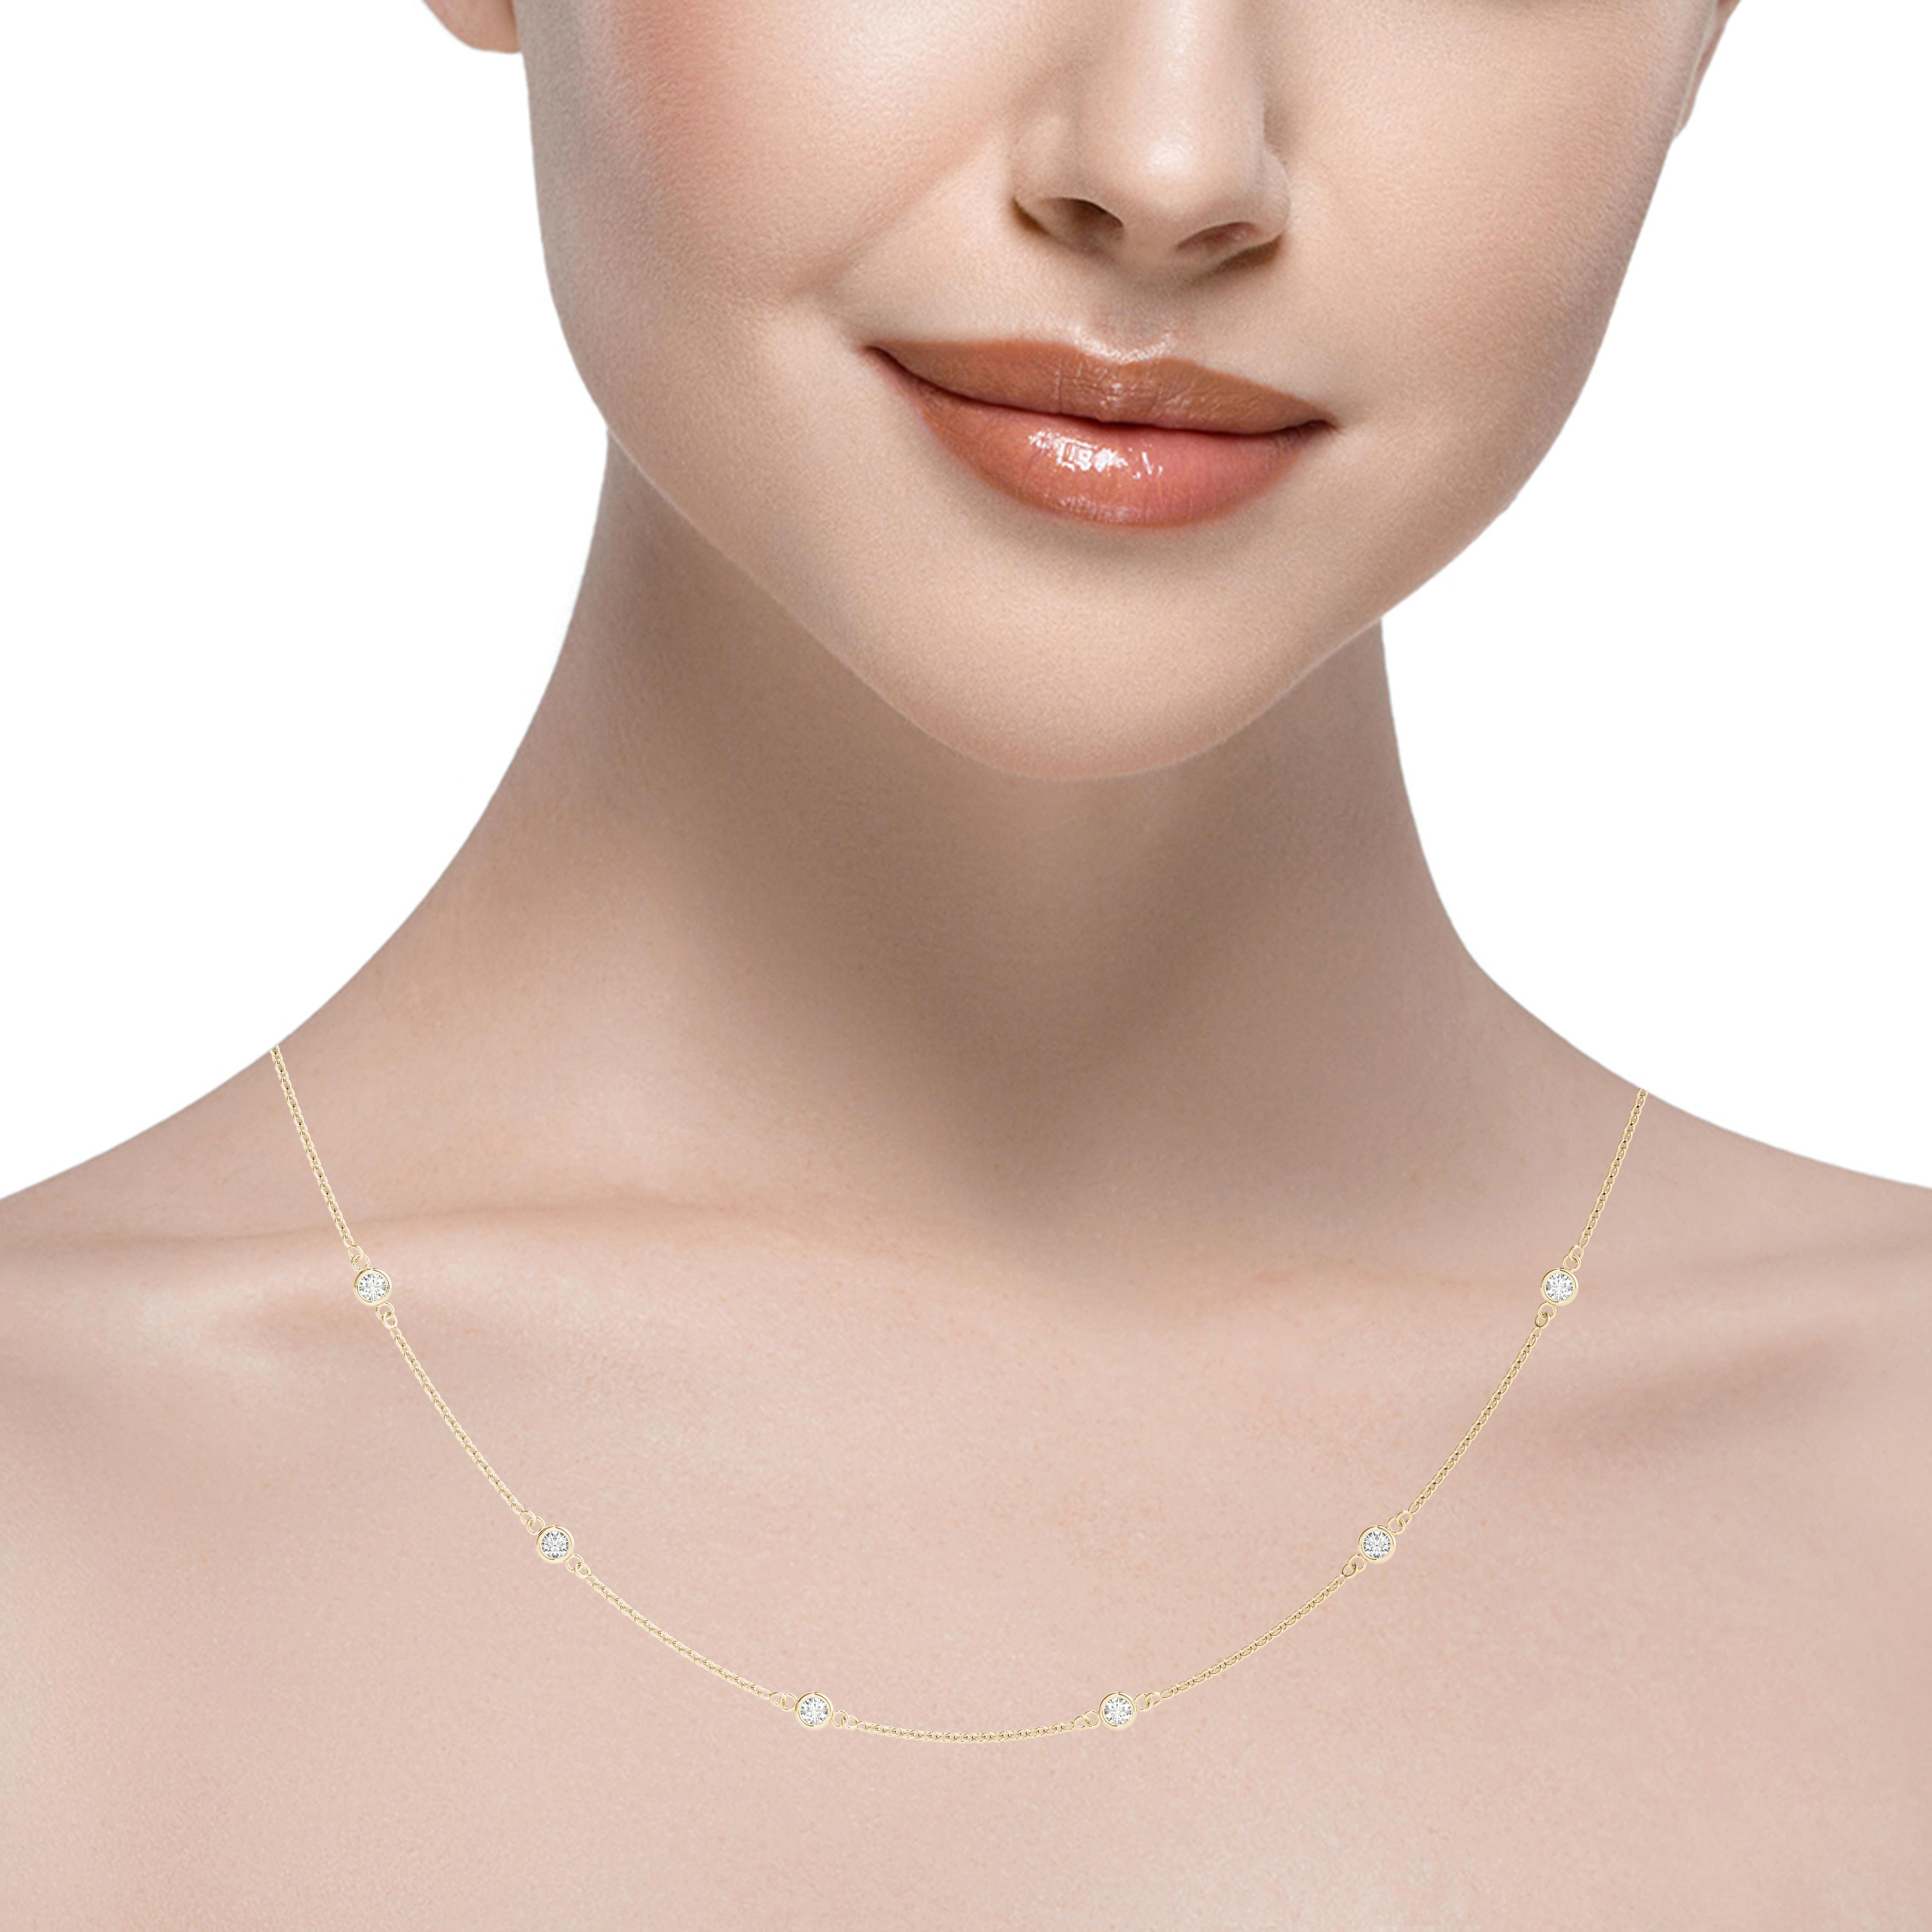 14k-yellow-gold-chain-diamond-necklace-60025-1